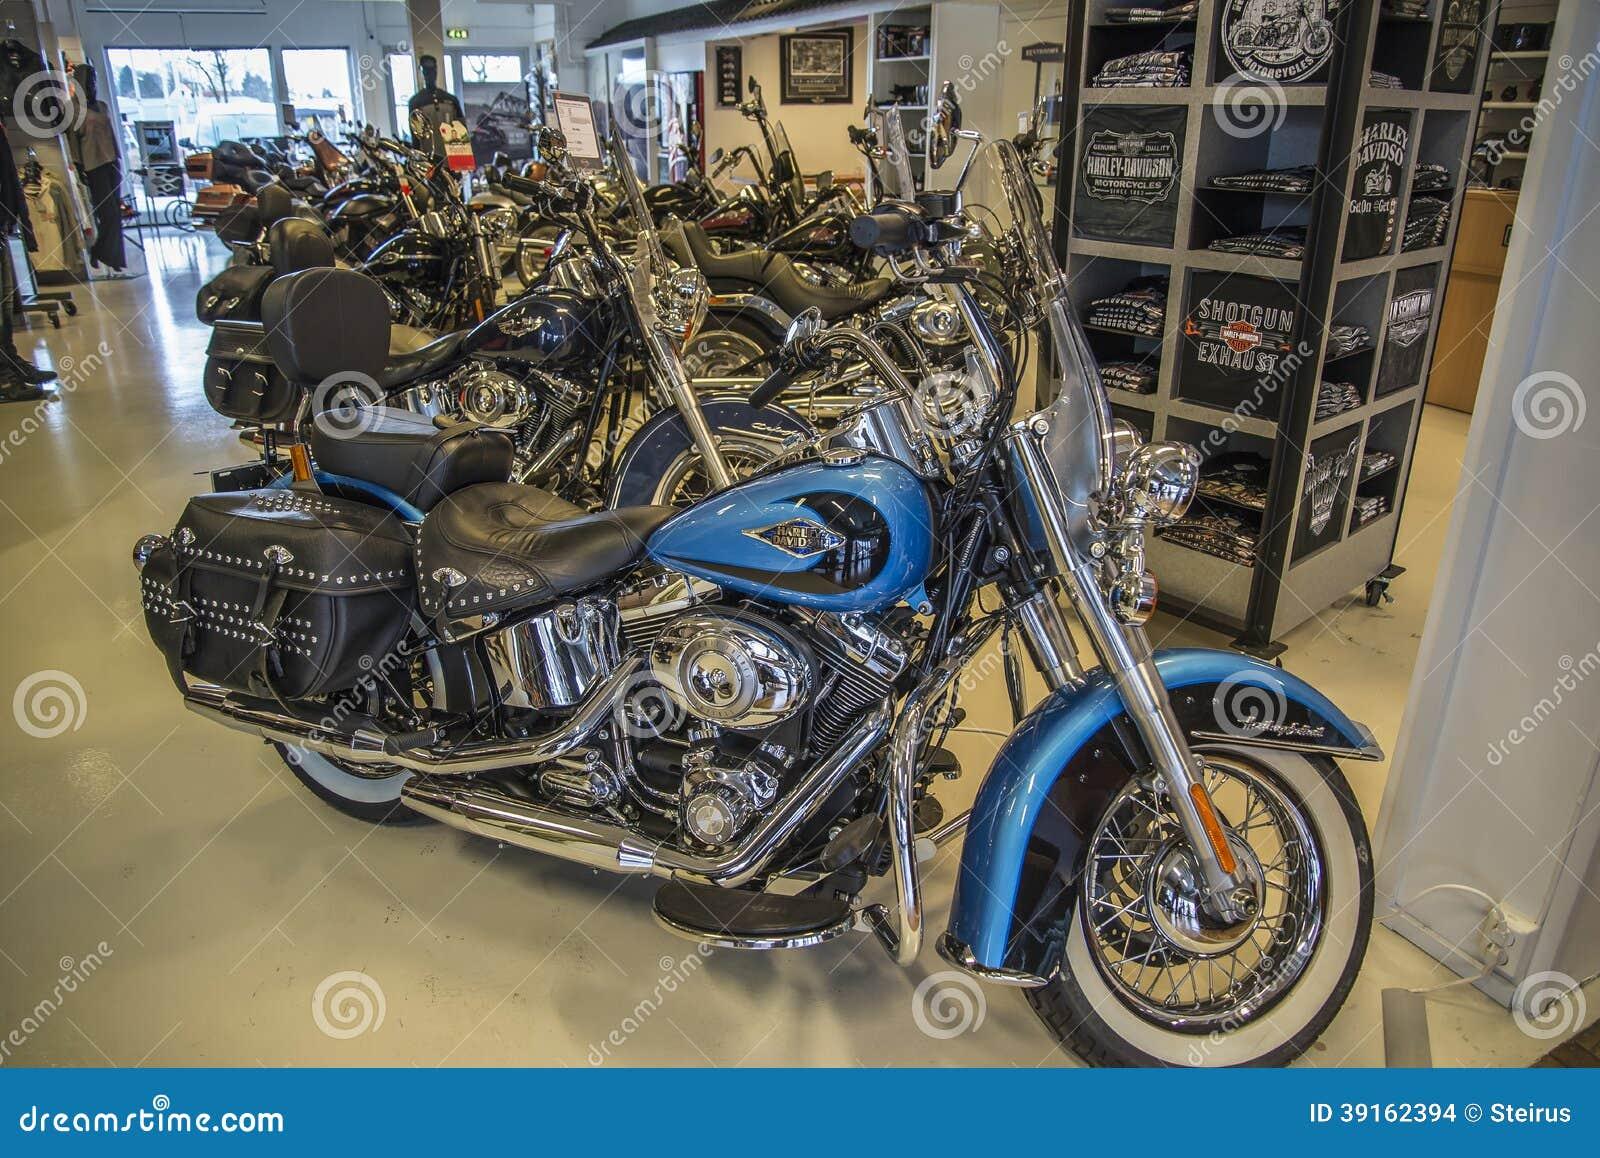 2011 Harley-Davidson, Softail Heritage Editorial Stock Image